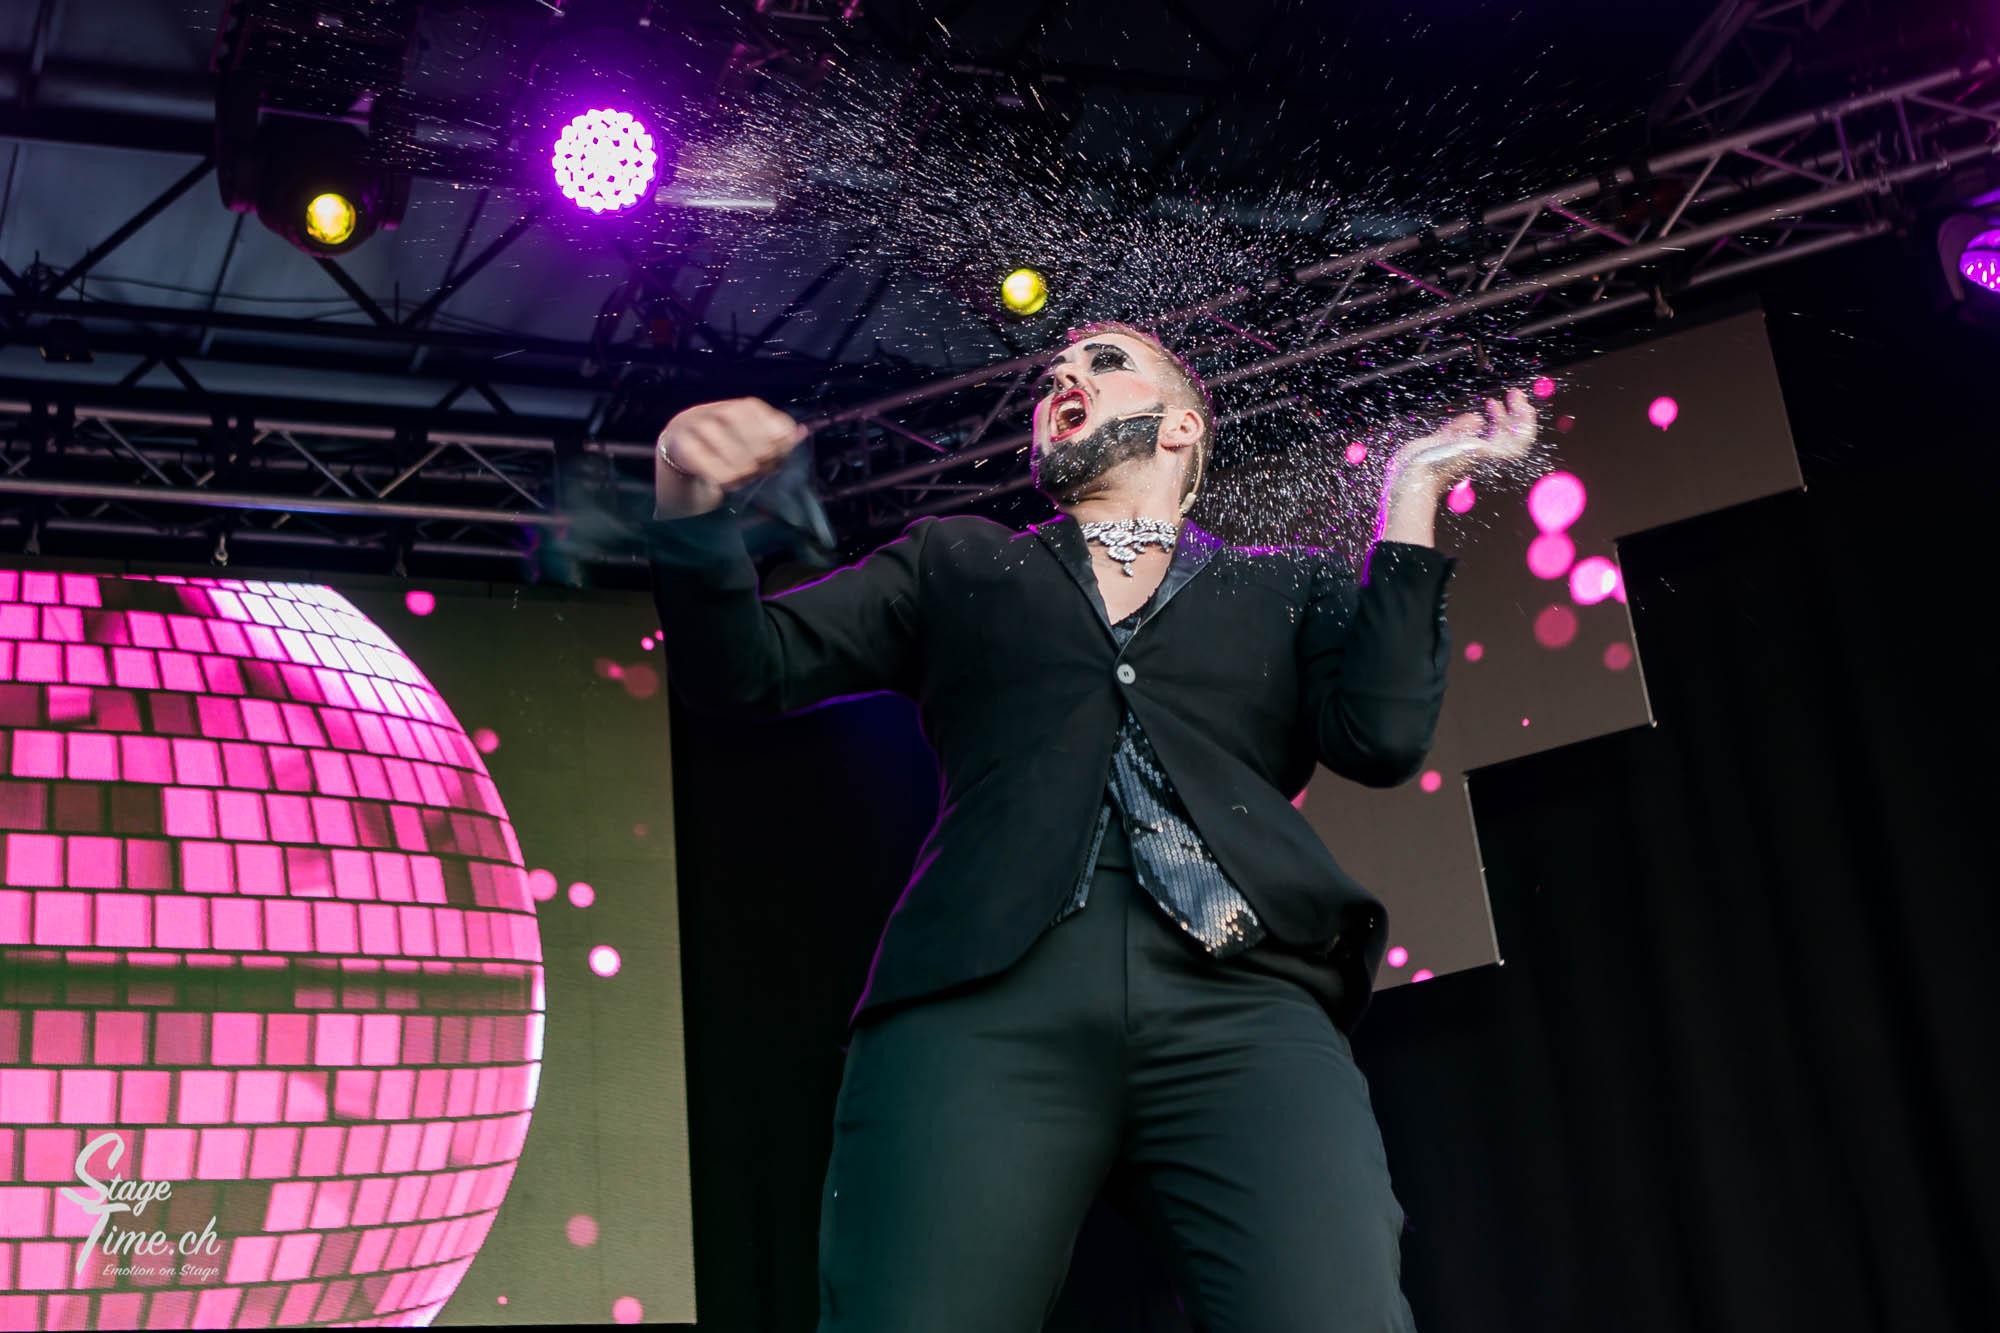 Zurich_Pride_Festival_2018___📷_Christoph_Gurtner___stagetime.ch-27